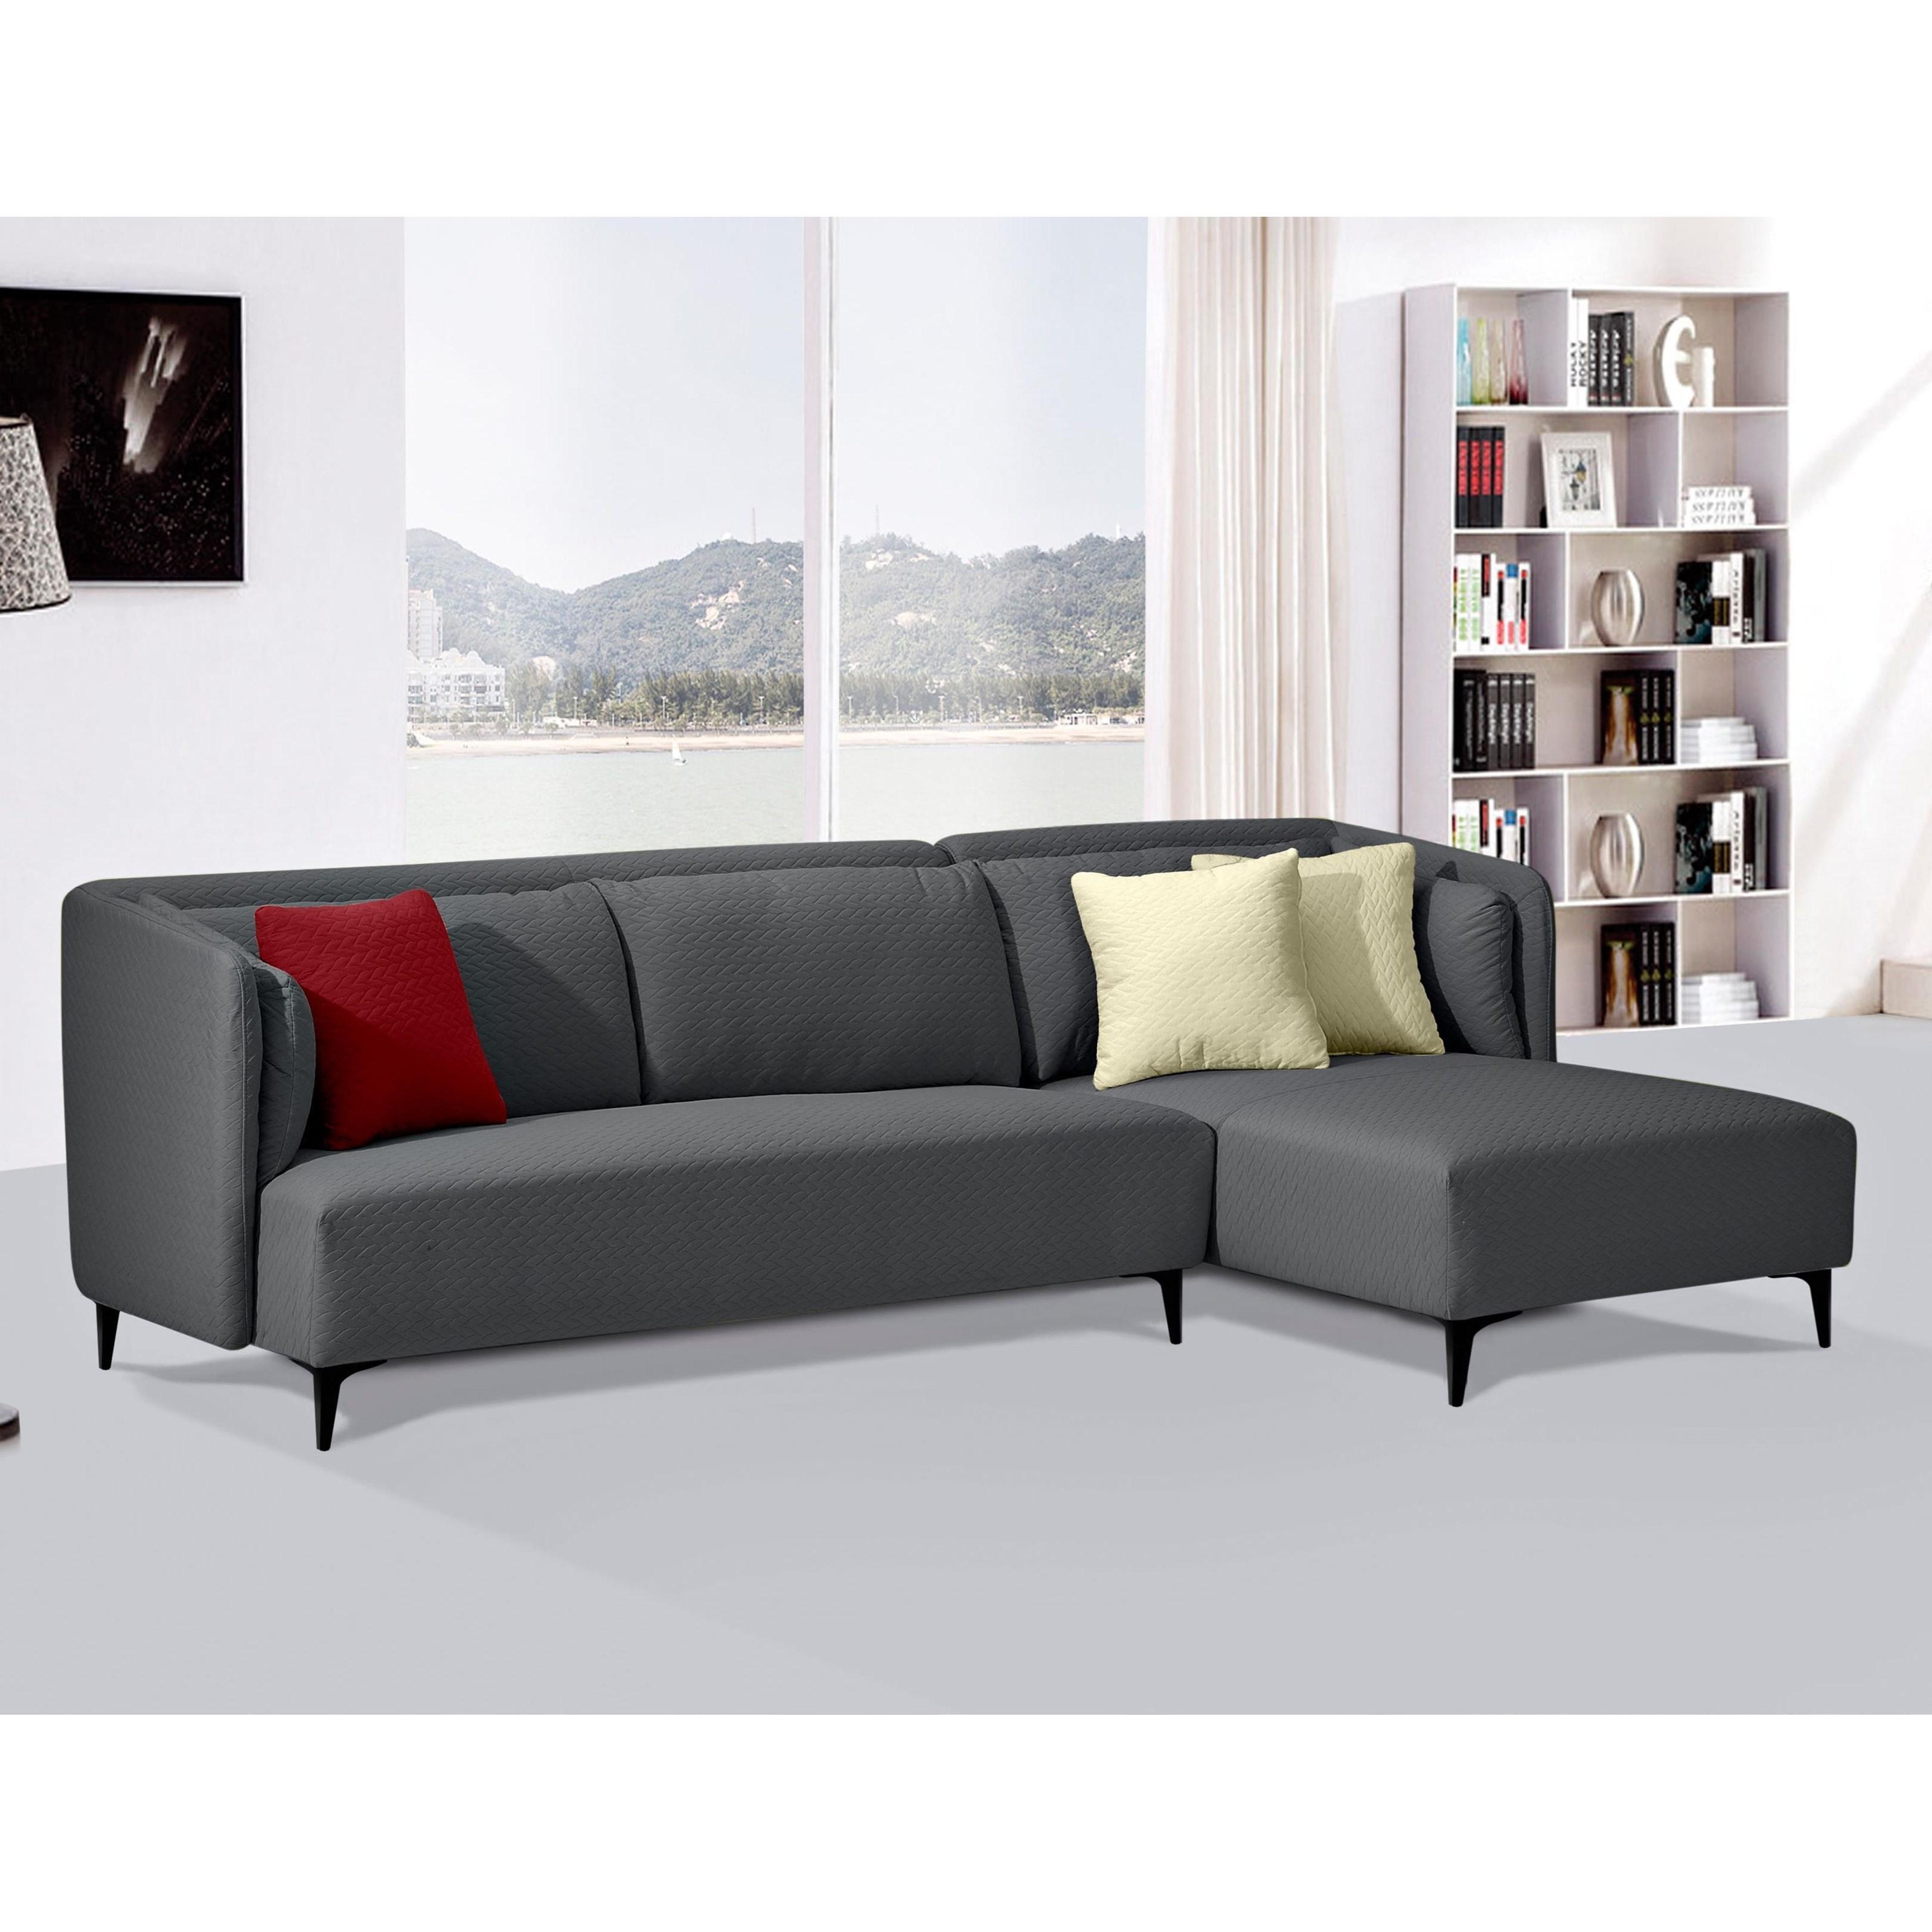 dylan jumbo cord black fabric corner group sofa diy murphy bed and brand new porto ferguson grey